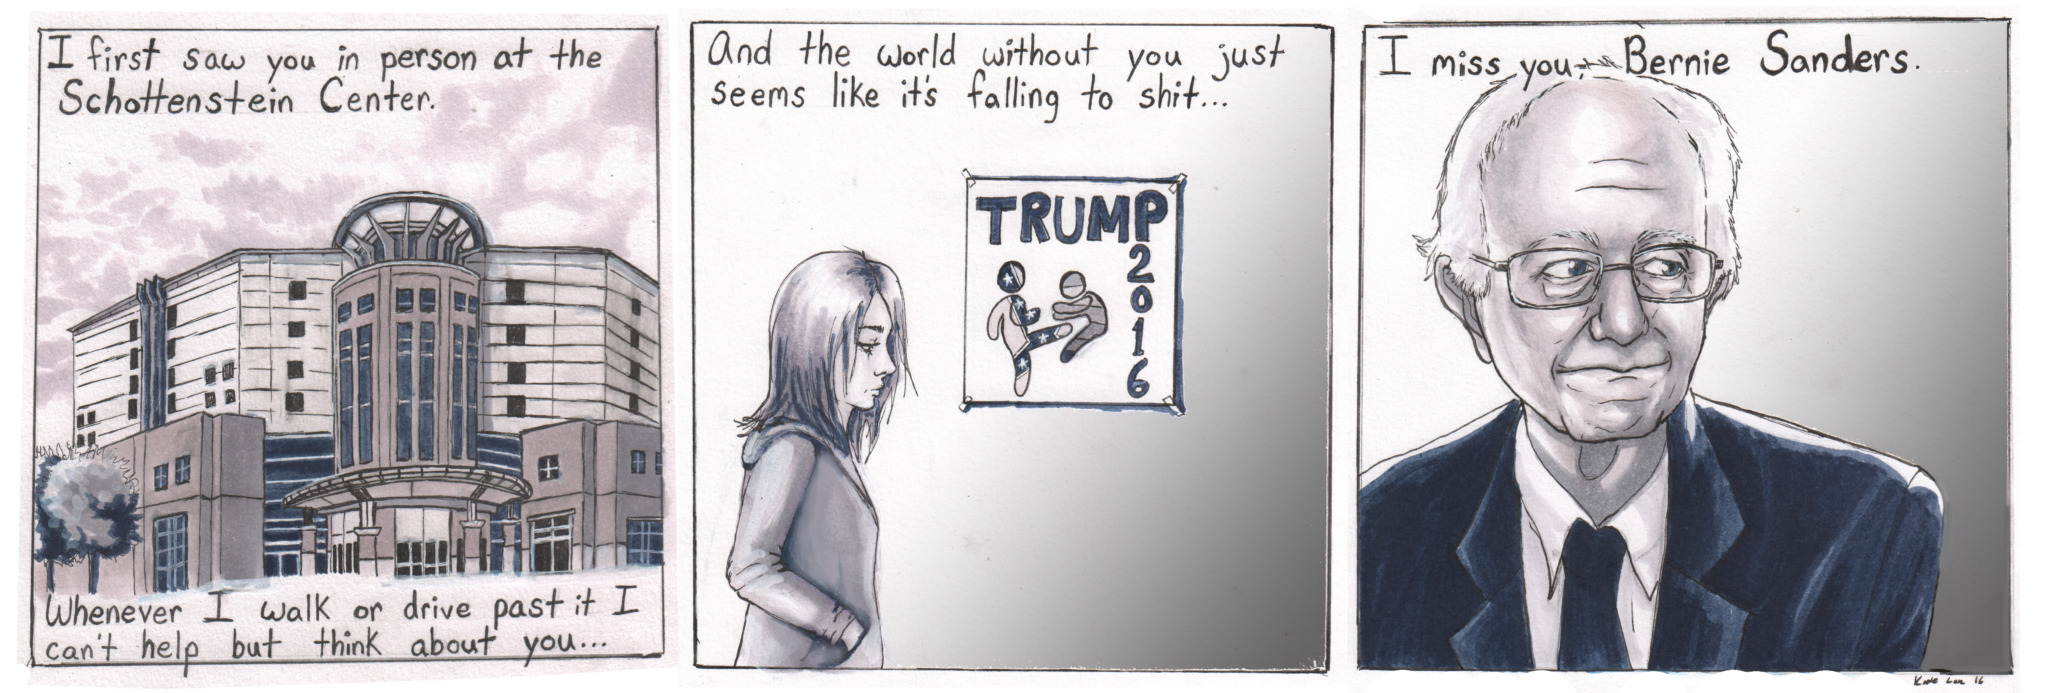 politicscomic